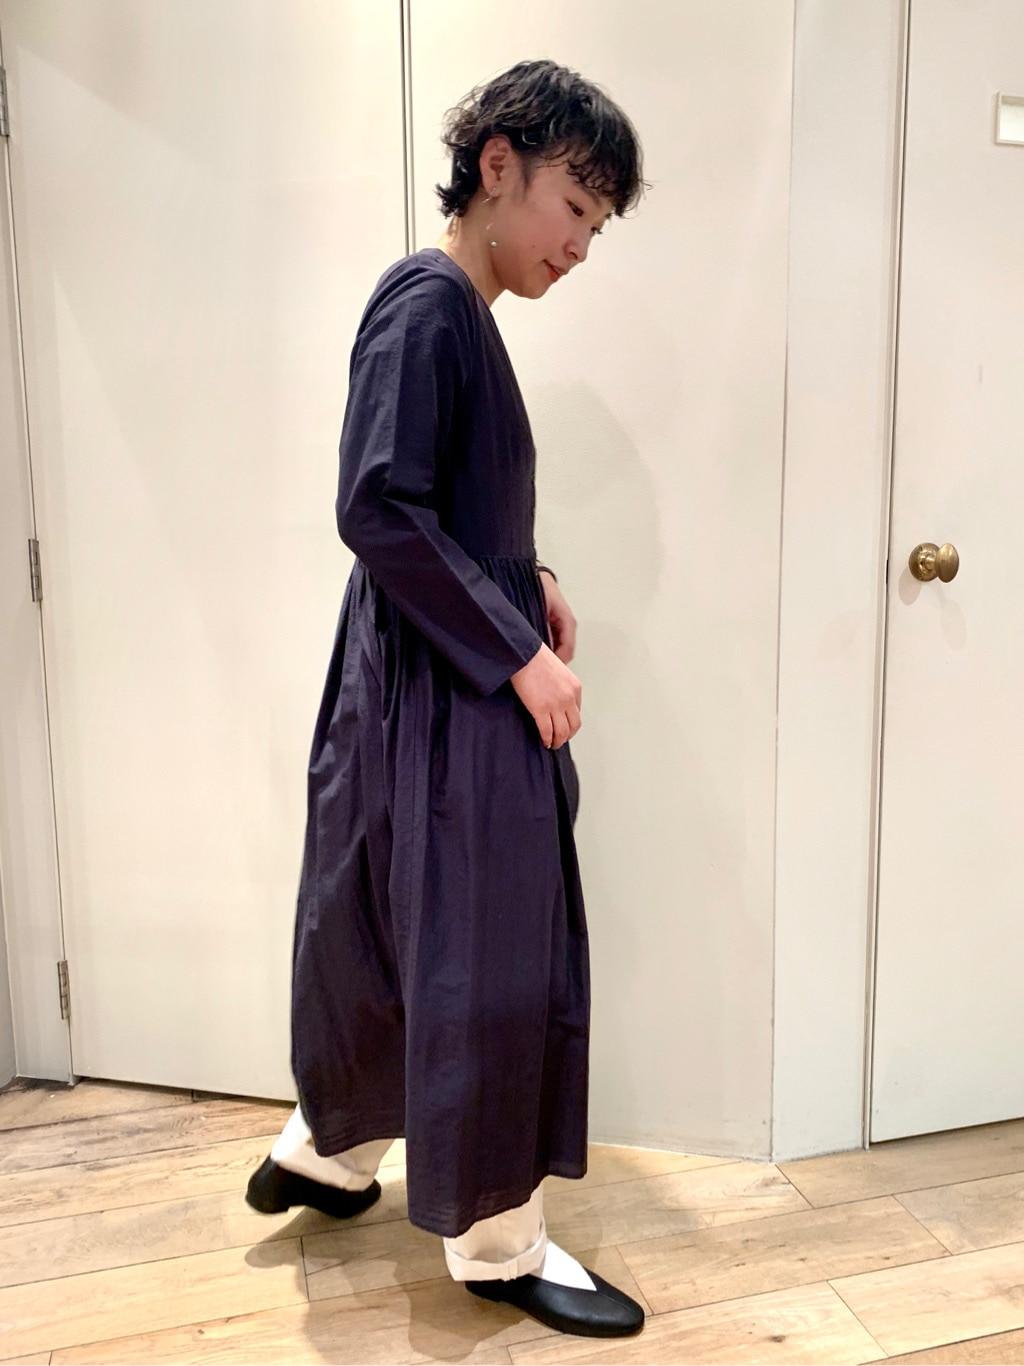 bulle de savon 新宿ミロード 身長:159cm 2020.05.13